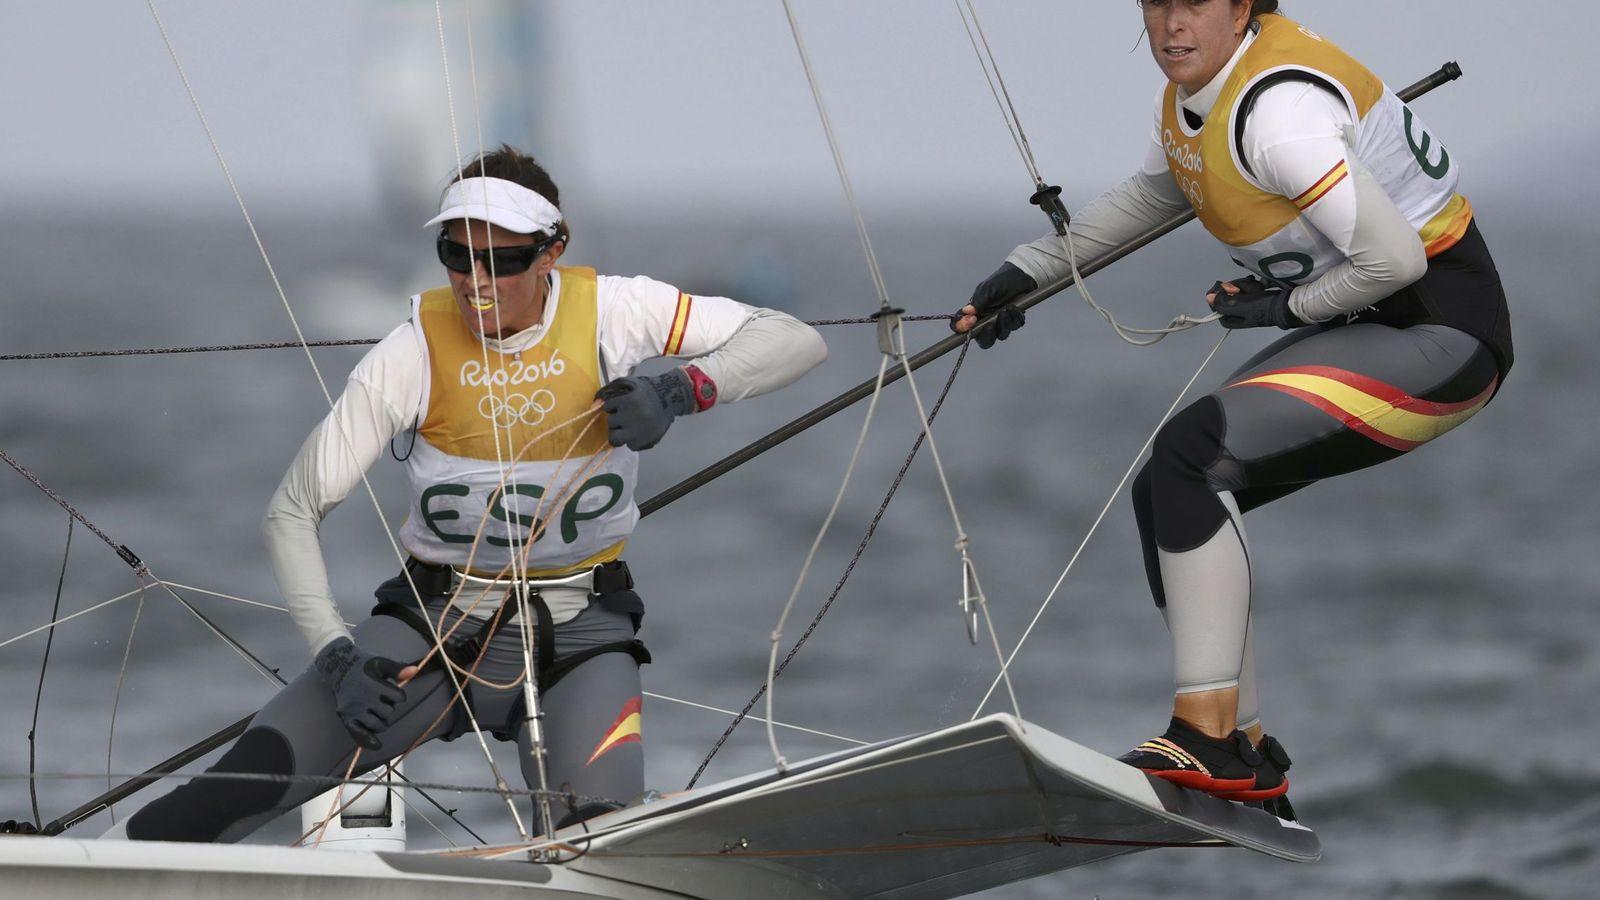 Foto: Tamara Echegoyen y Berta Betanzos  durante la 'Medal race'  (Benoit Tessier/REUTERS)